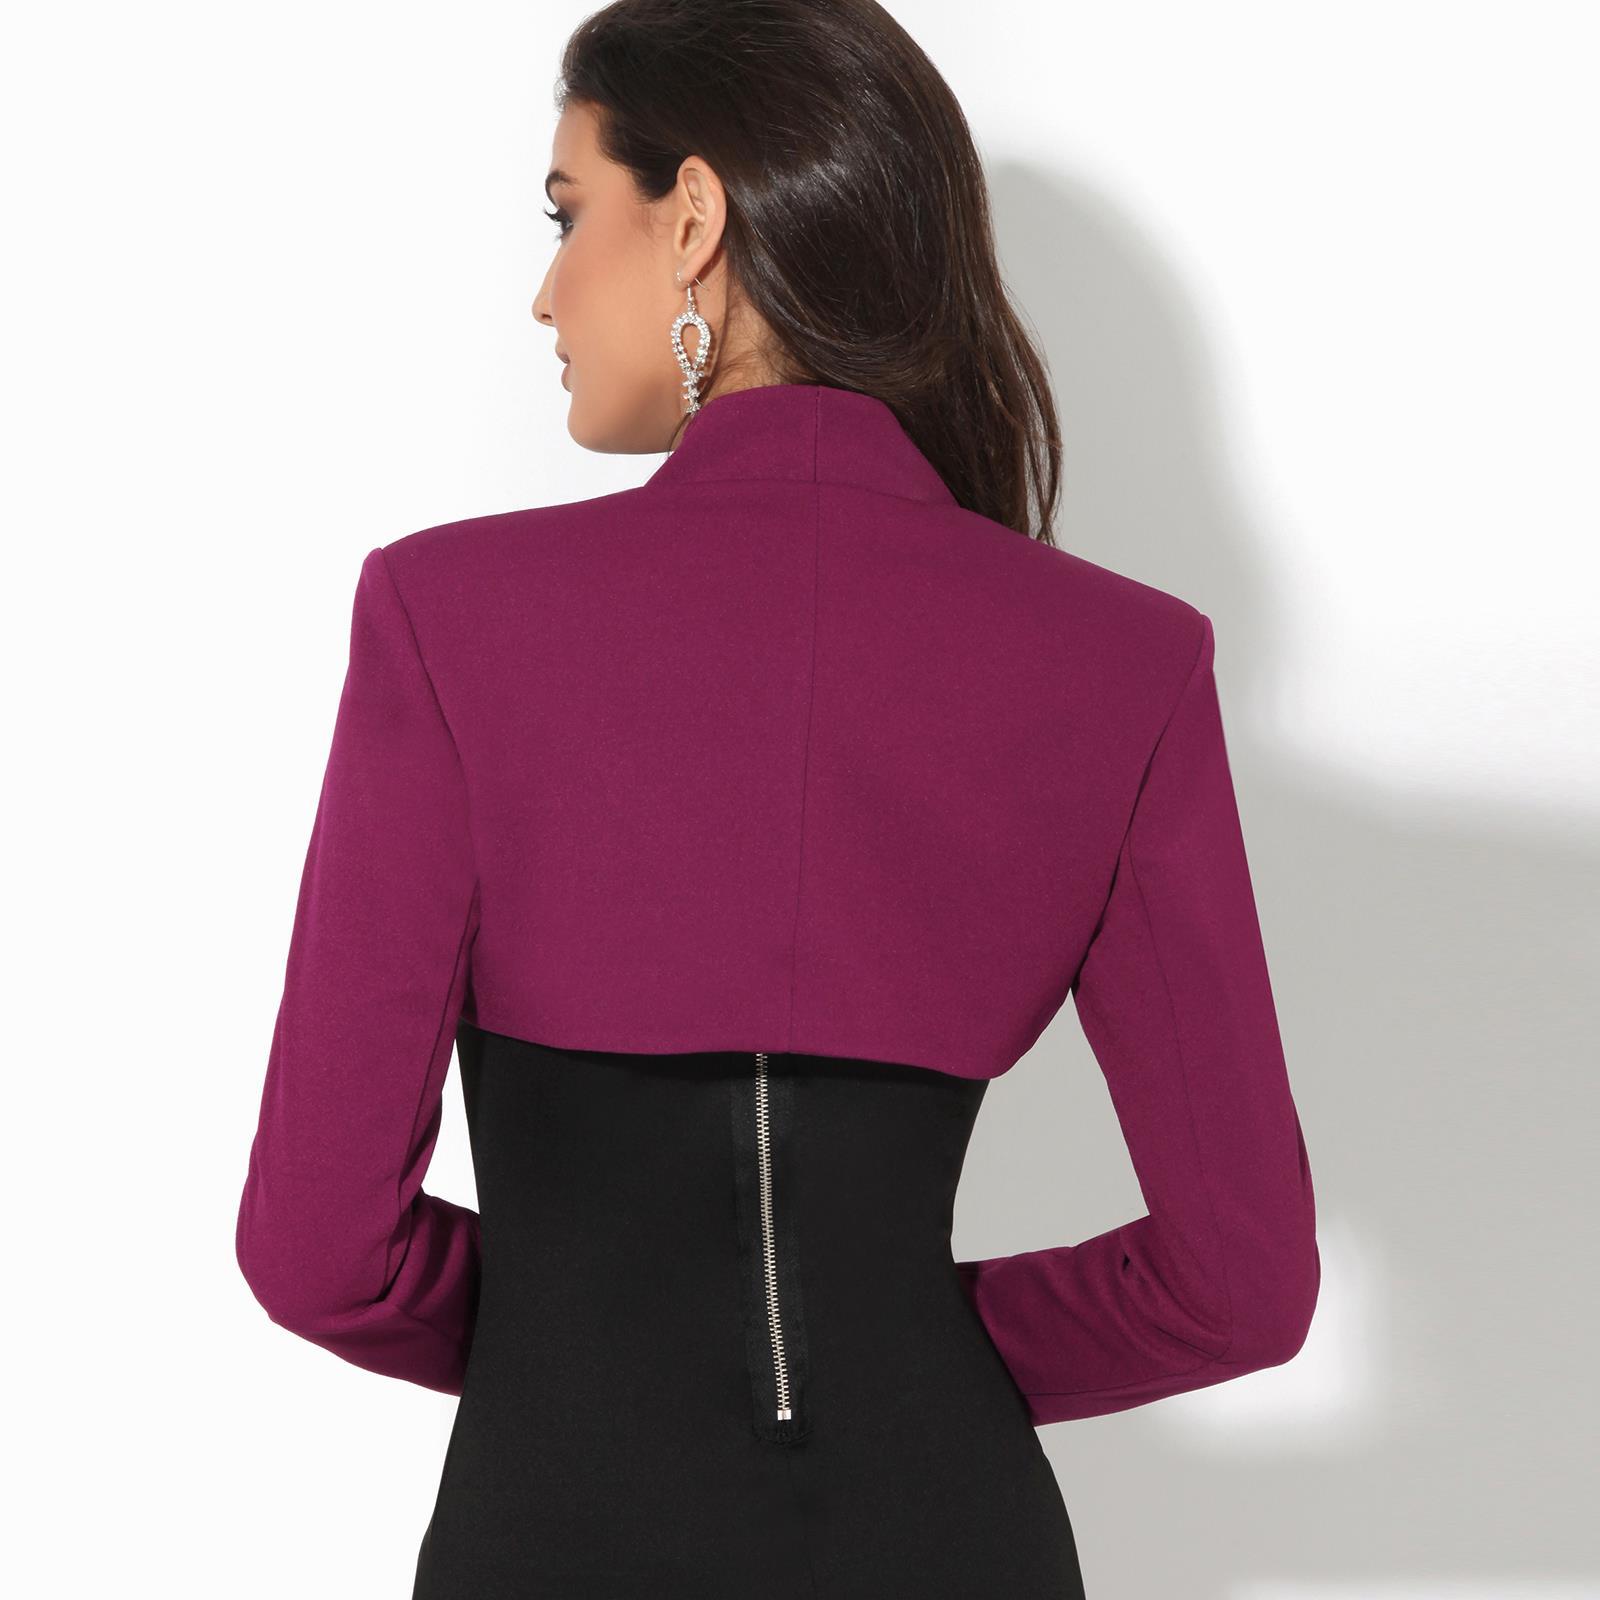 Womens-Ladies-Bolero-Jacket-Shrug-Chiffon-Long-Sleeve-Crop-Top-Blazer-Coat-Party thumbnail 5